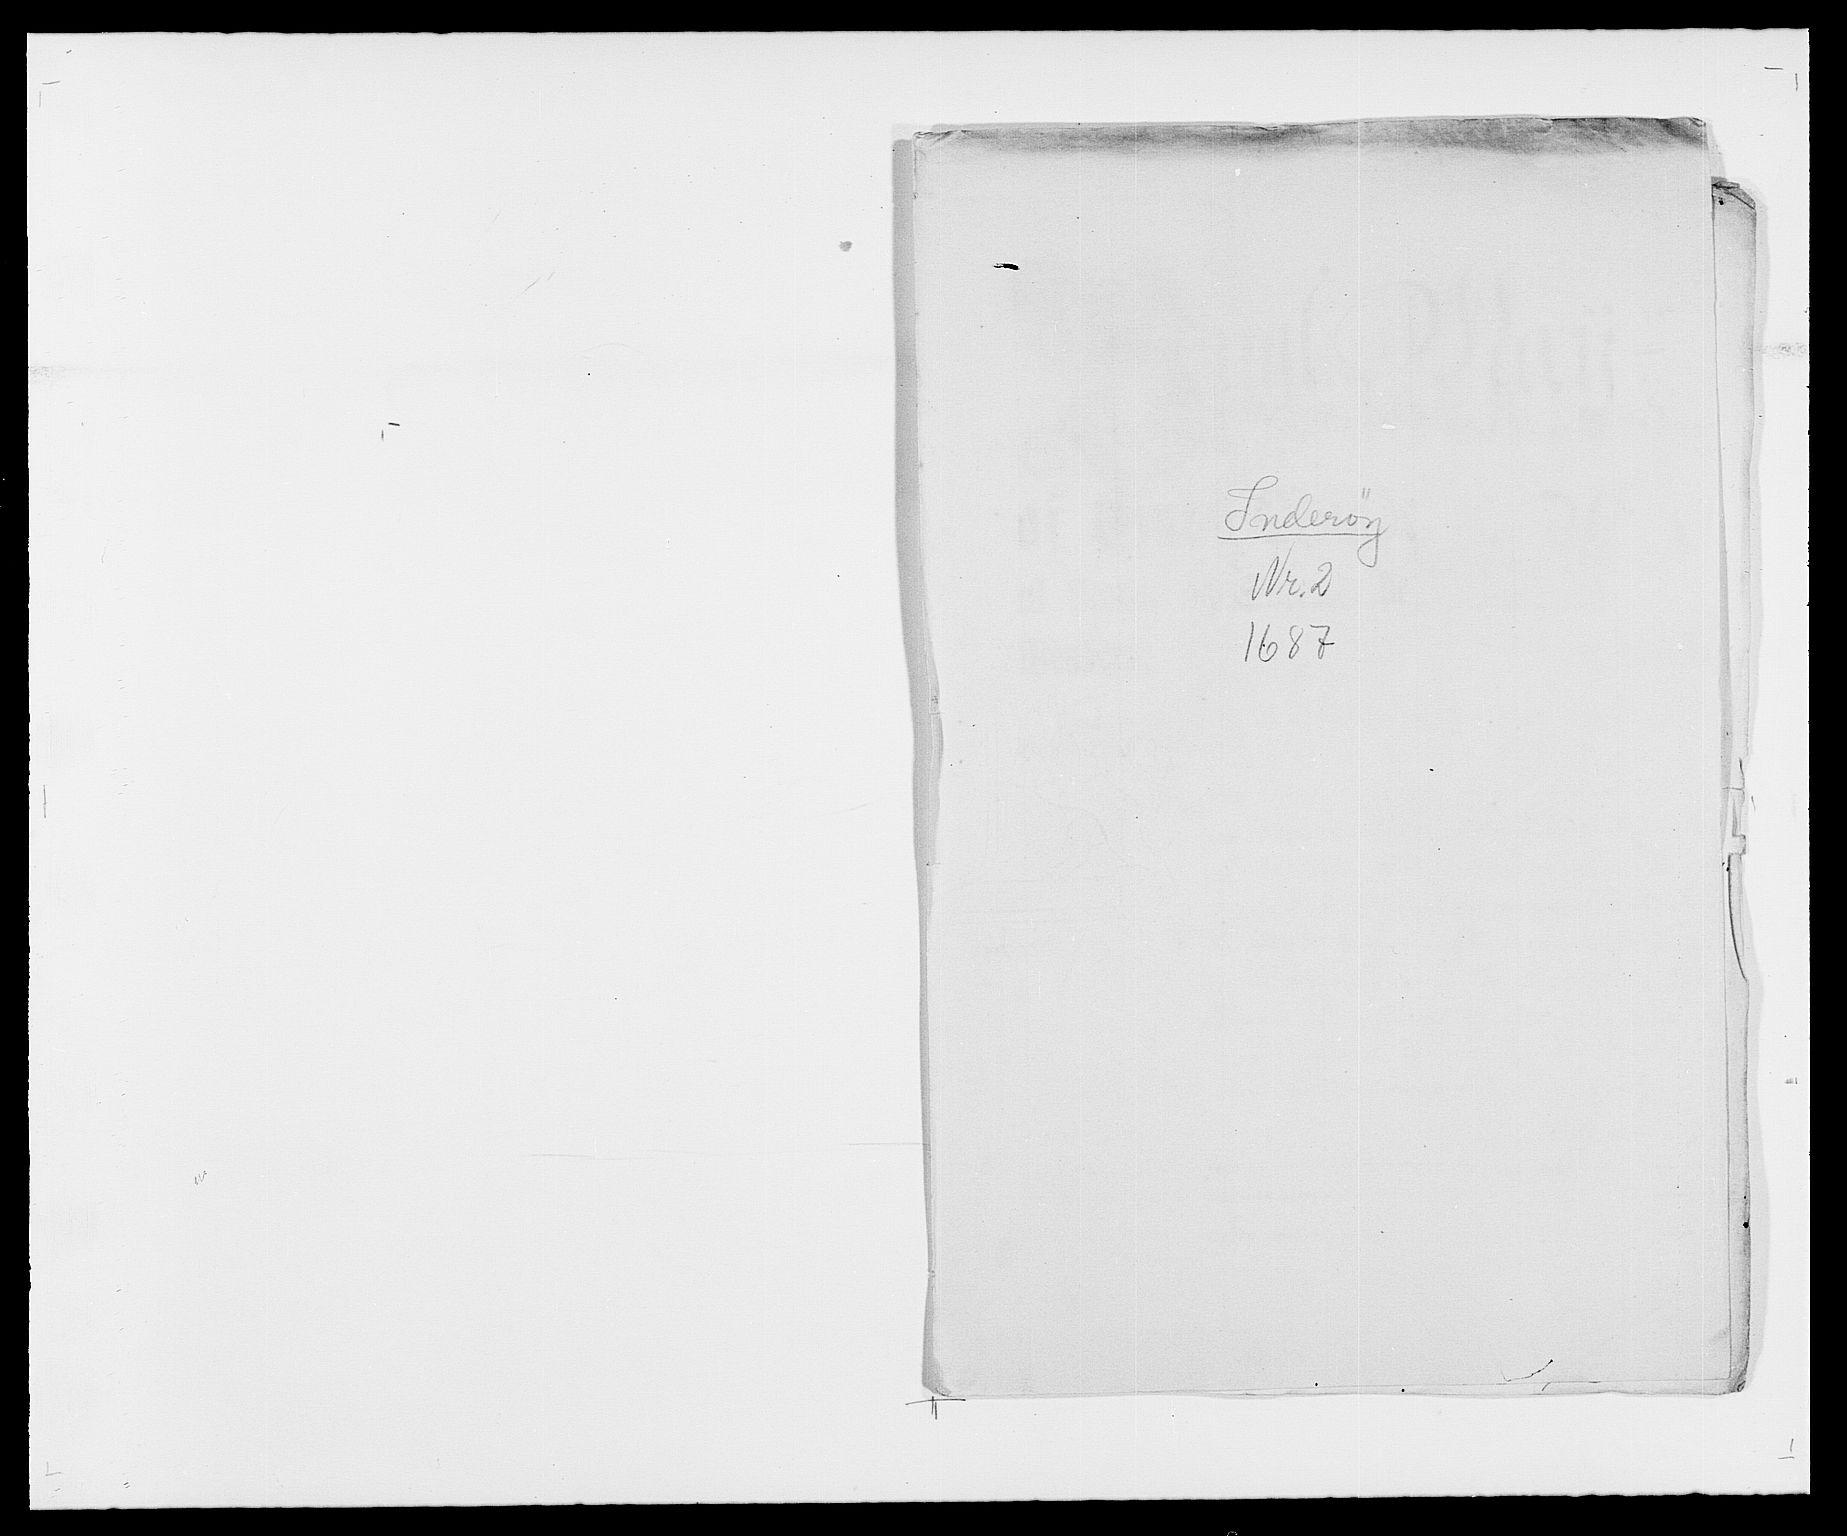 RA, Rentekammeret inntil 1814, Reviderte regnskaper, Fogderegnskap, R63/L4306: Fogderegnskap Inderøy, 1687-1689, s. 198